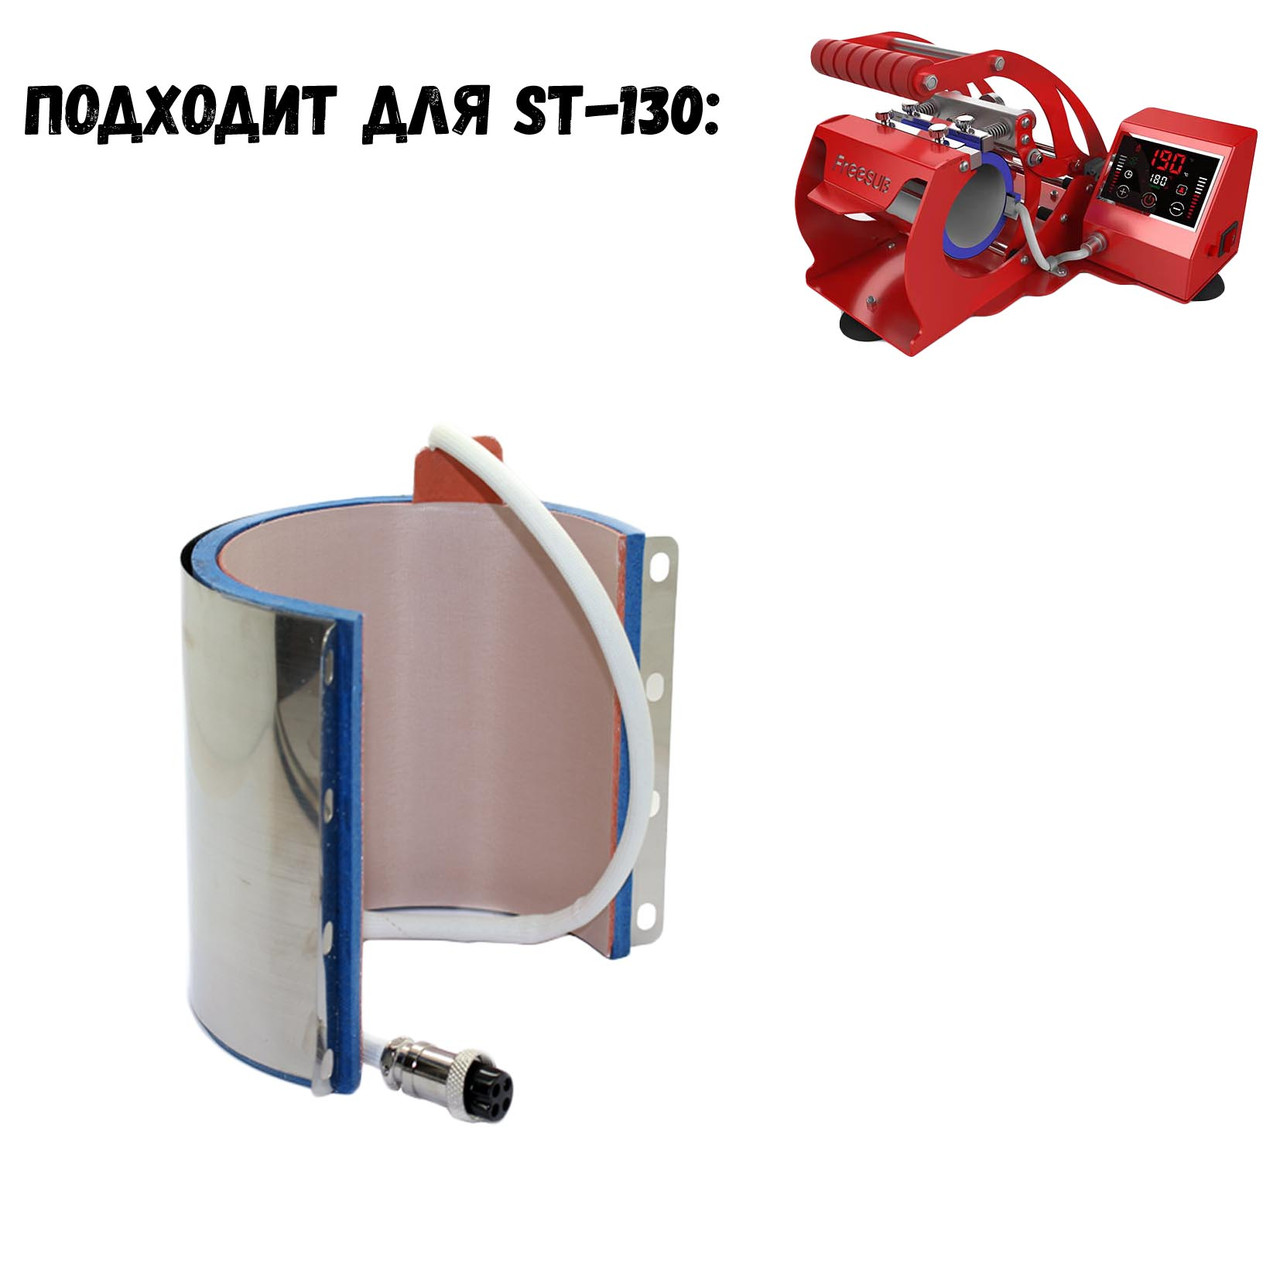 Термоэлемент для кружки 330мл (7.5 - 9 см, разъем мама) FreeSub ST-130